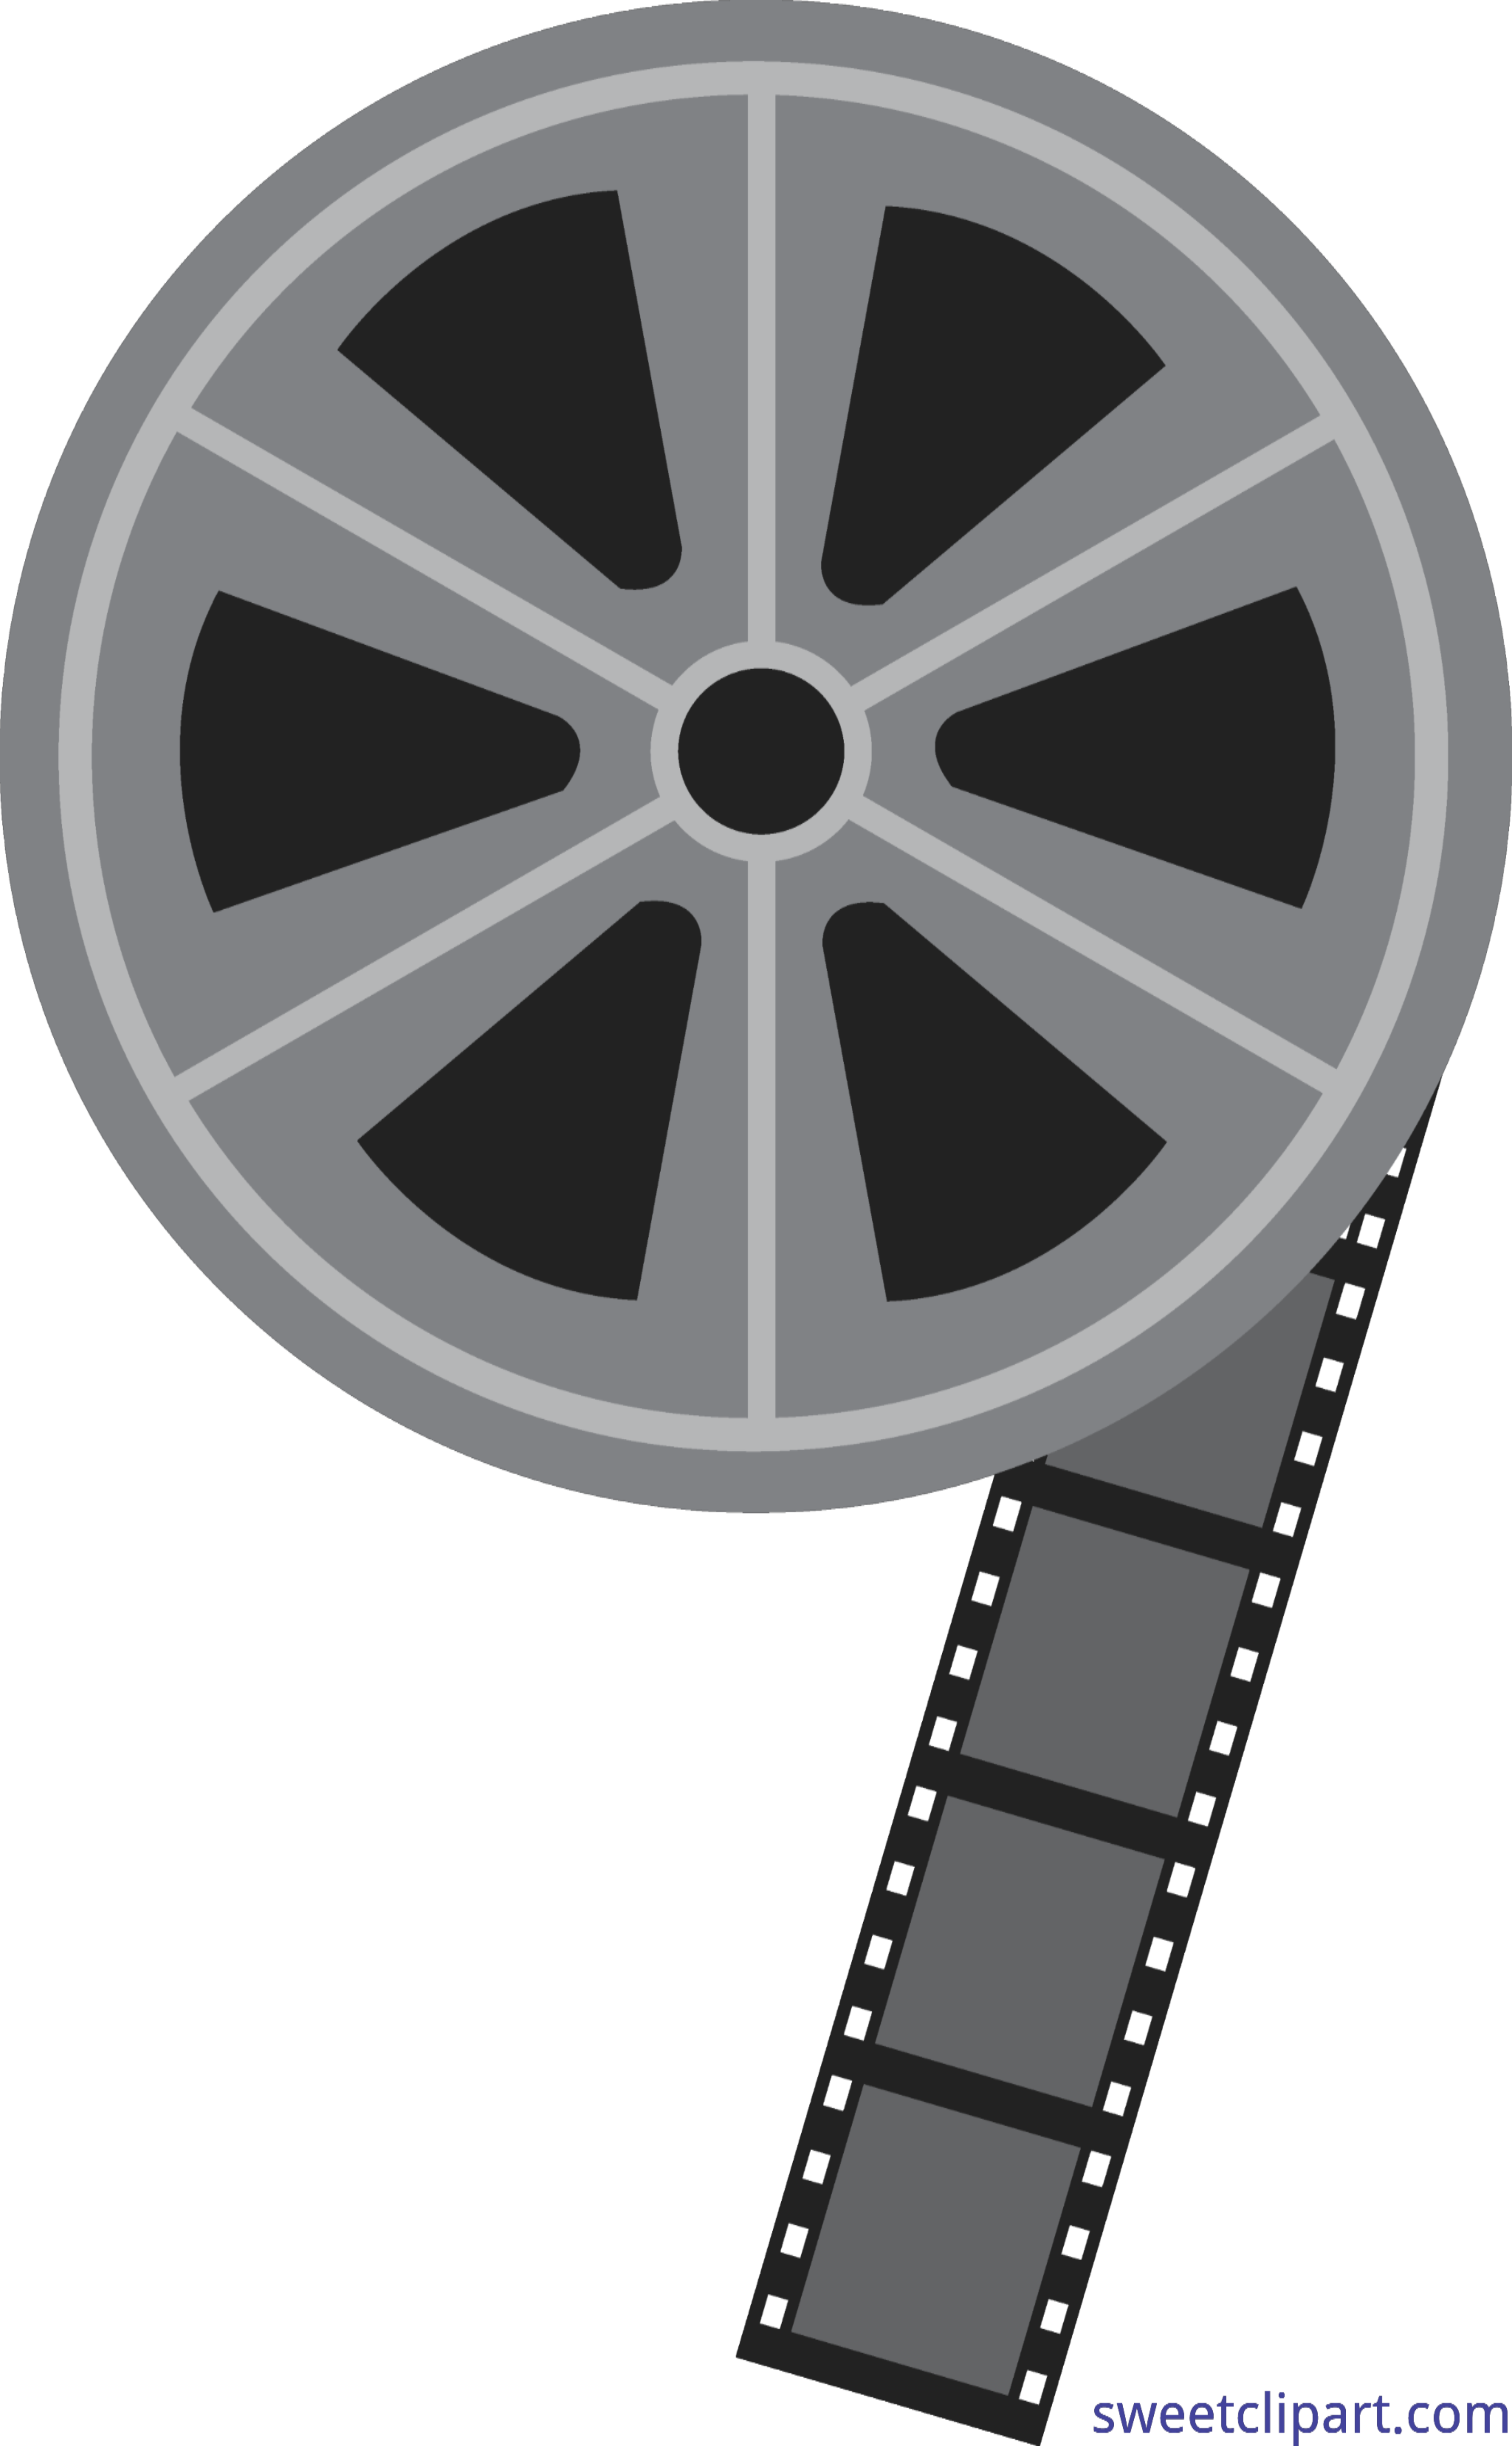 Reel clip art sweet. Film clipart wheel